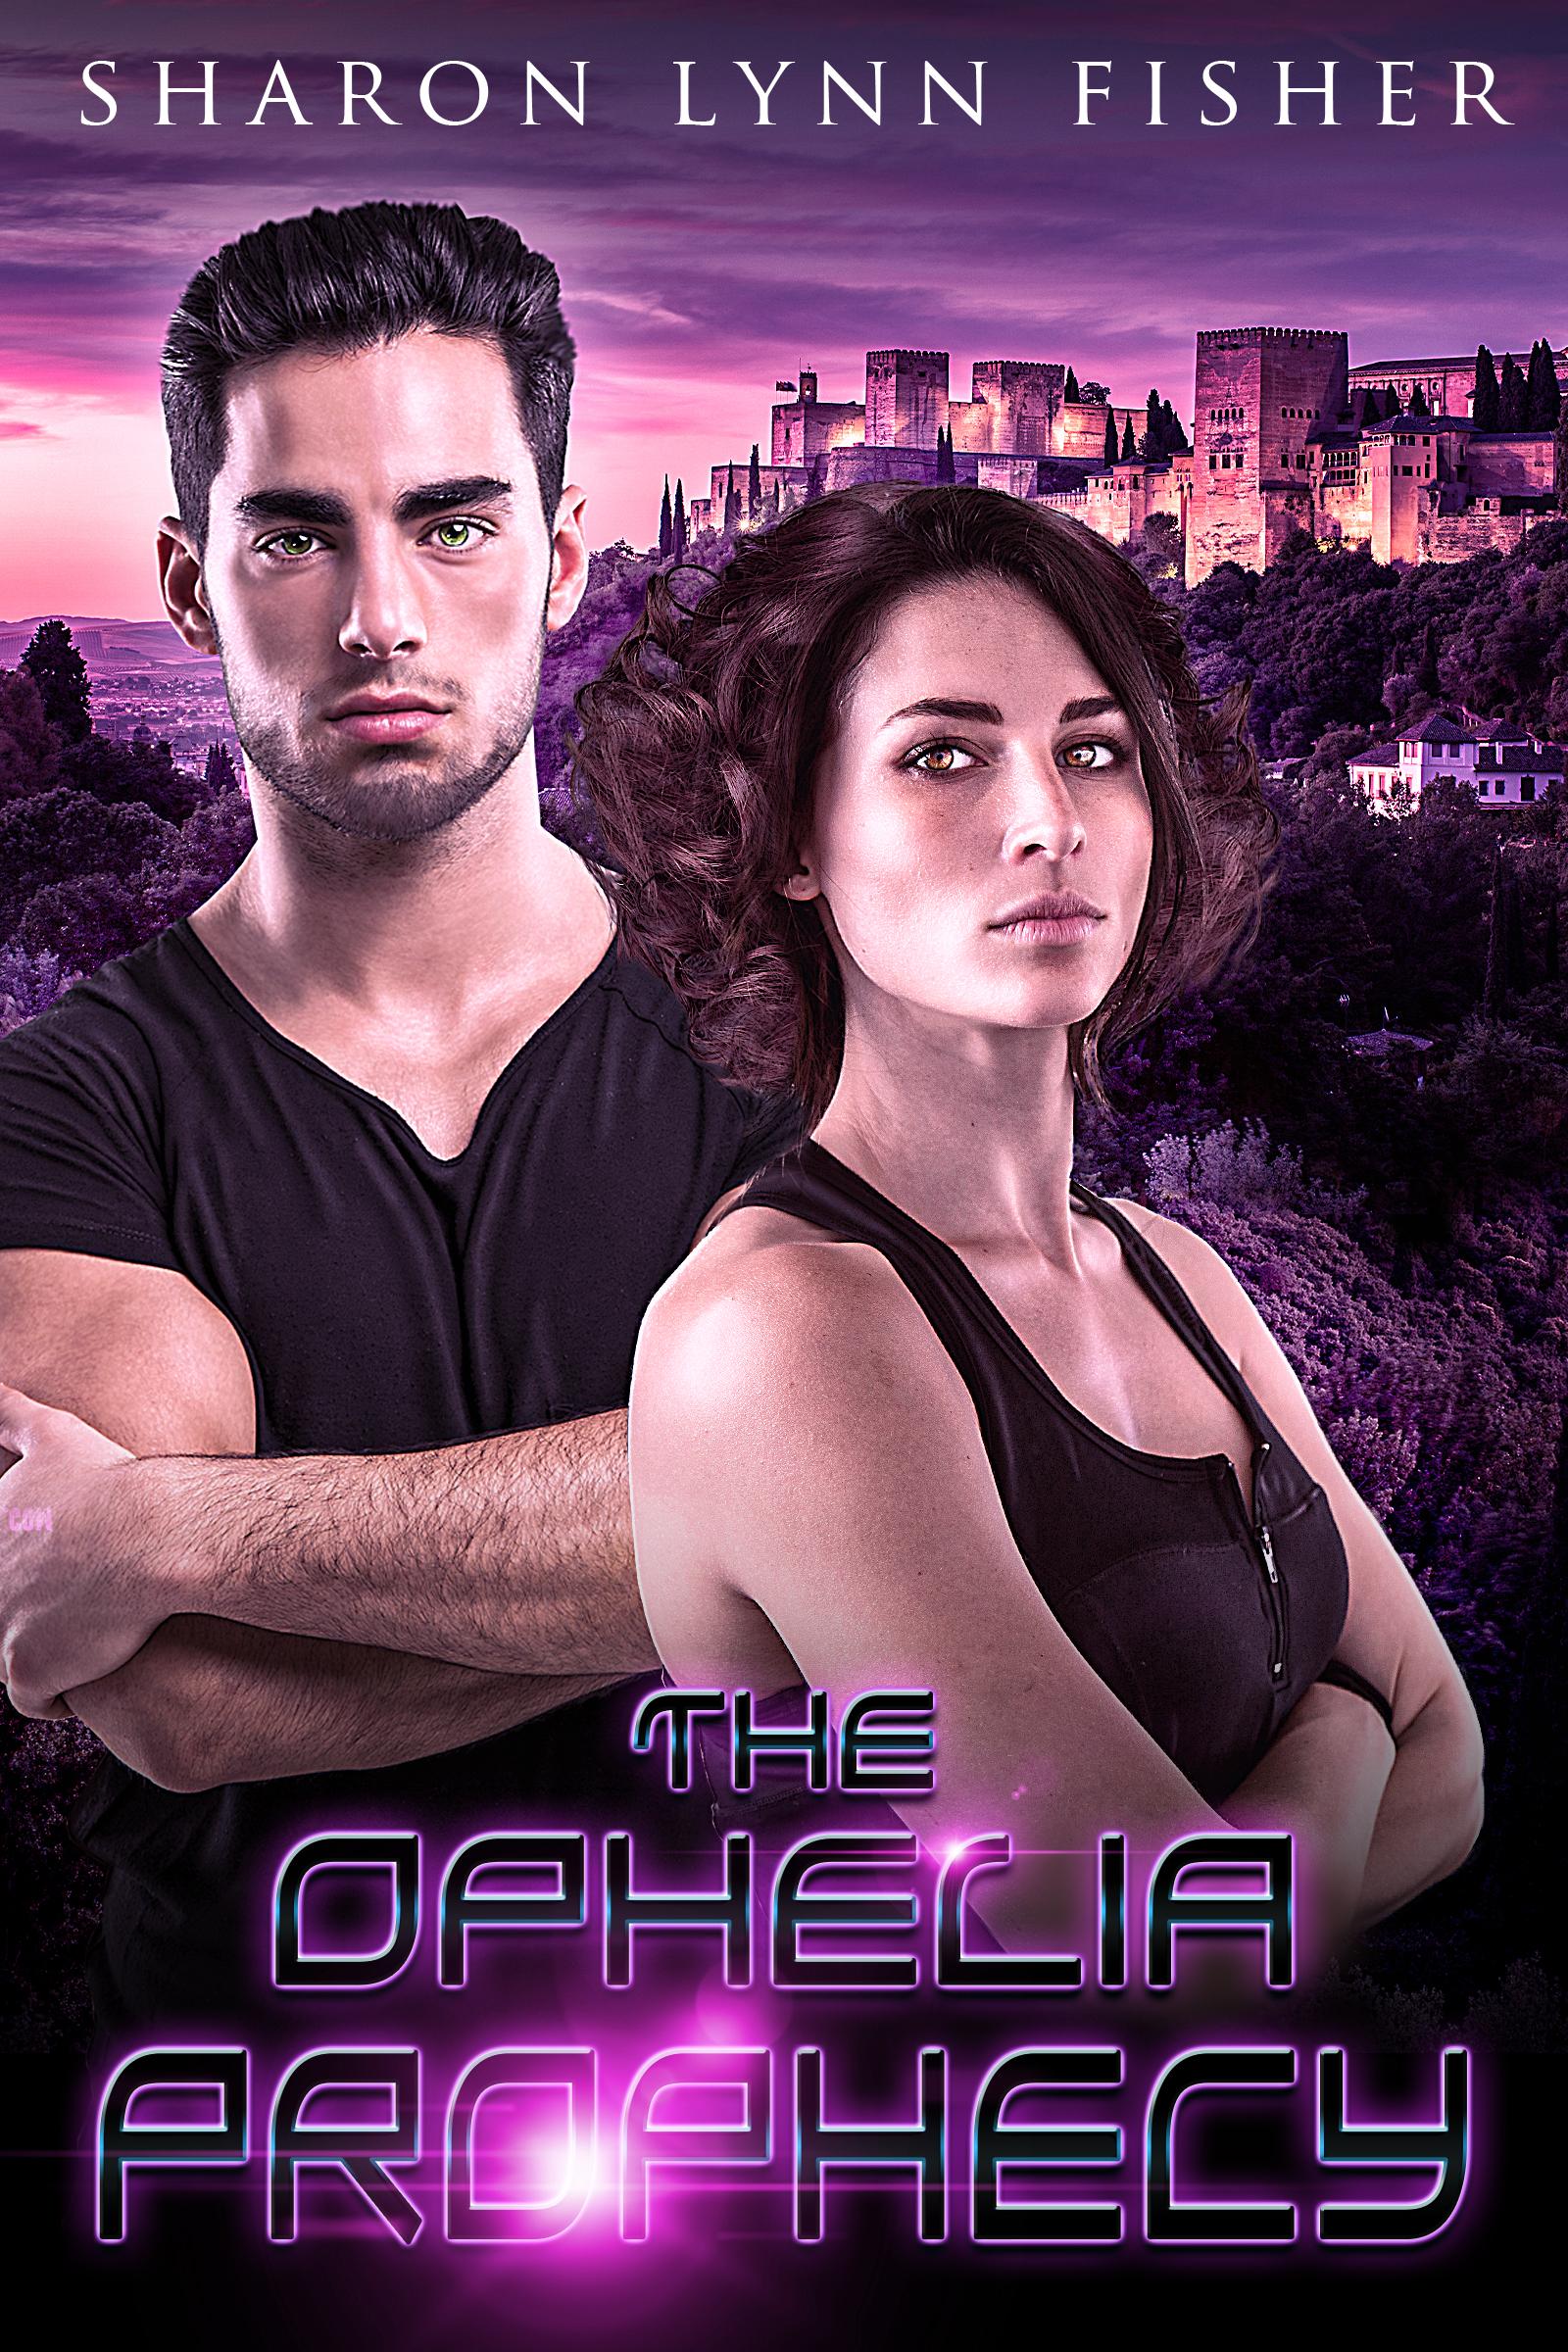 ophelia prophecy, sharon lynn fisher, book, novel, scifi, sci-fi